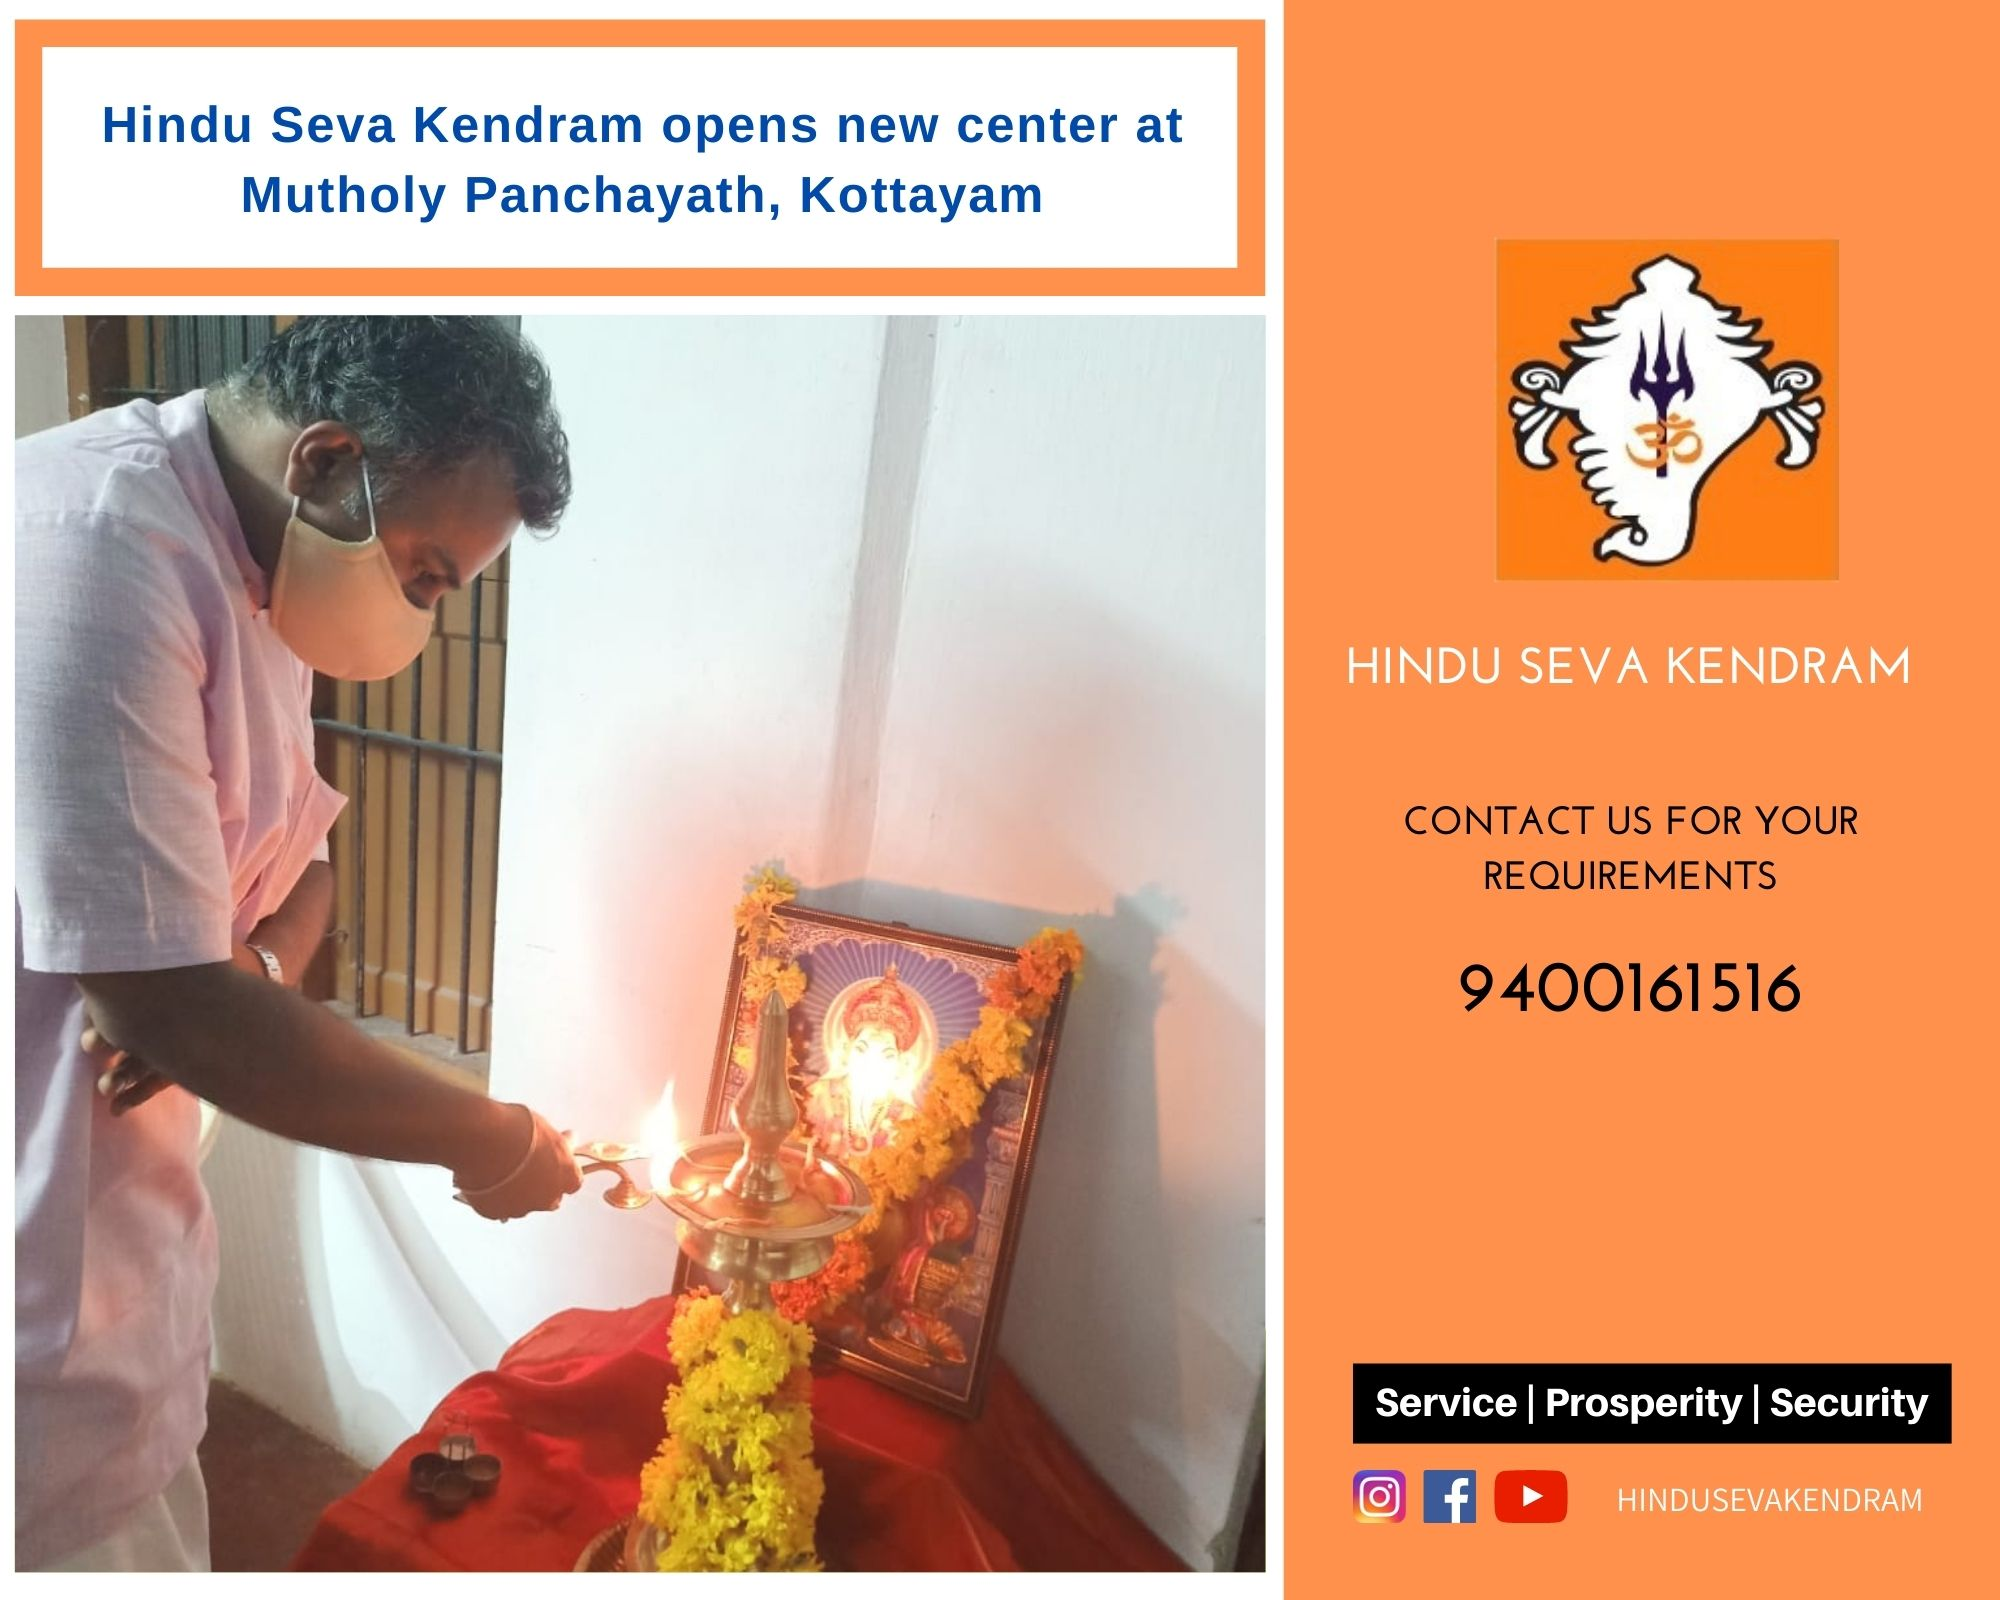 Hindu Seva Kendram opens new center at Mutholy Panchayath, Kottayam